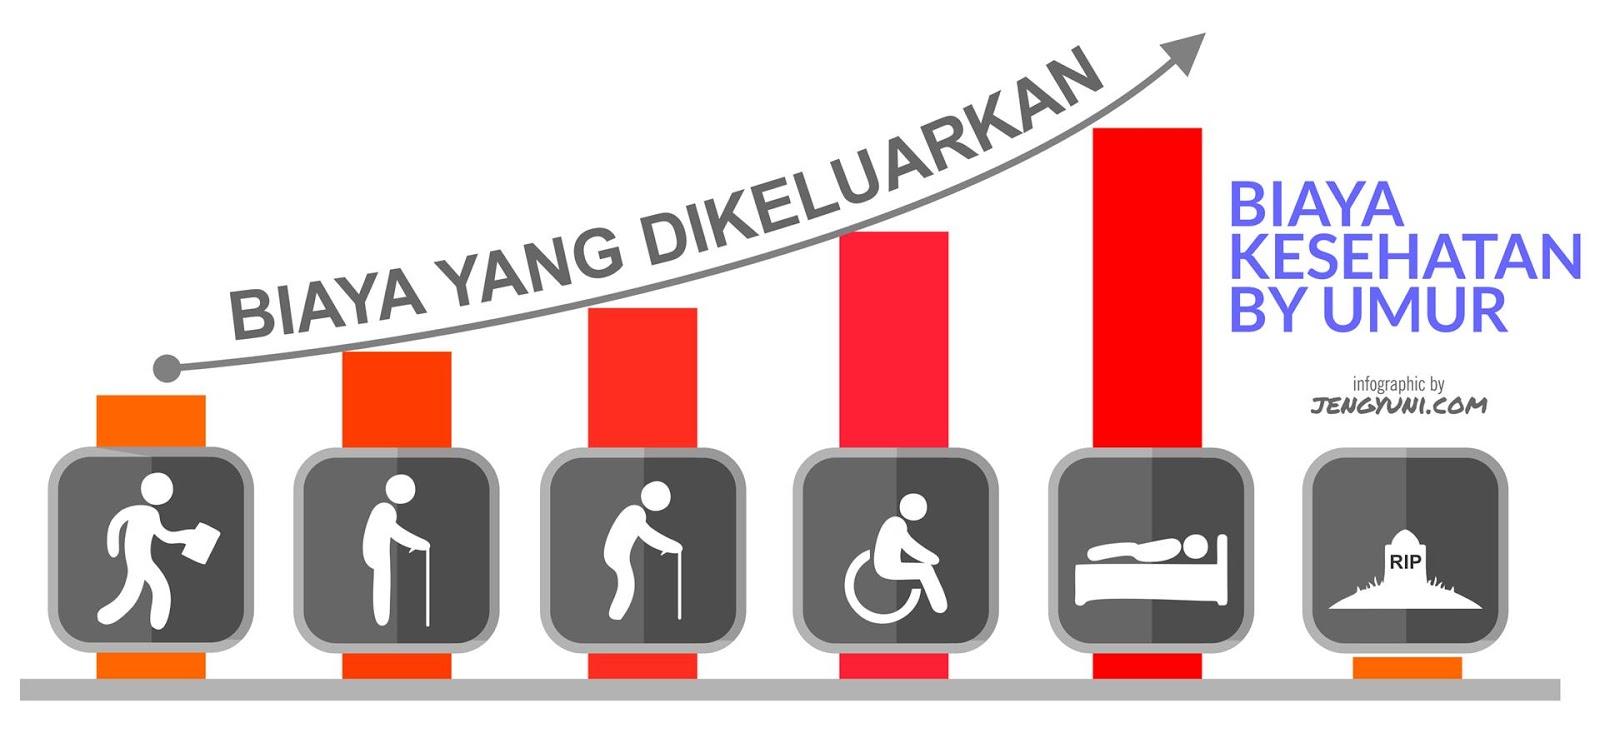 Biaya Kesehatan by umur - yuk atur uangmu